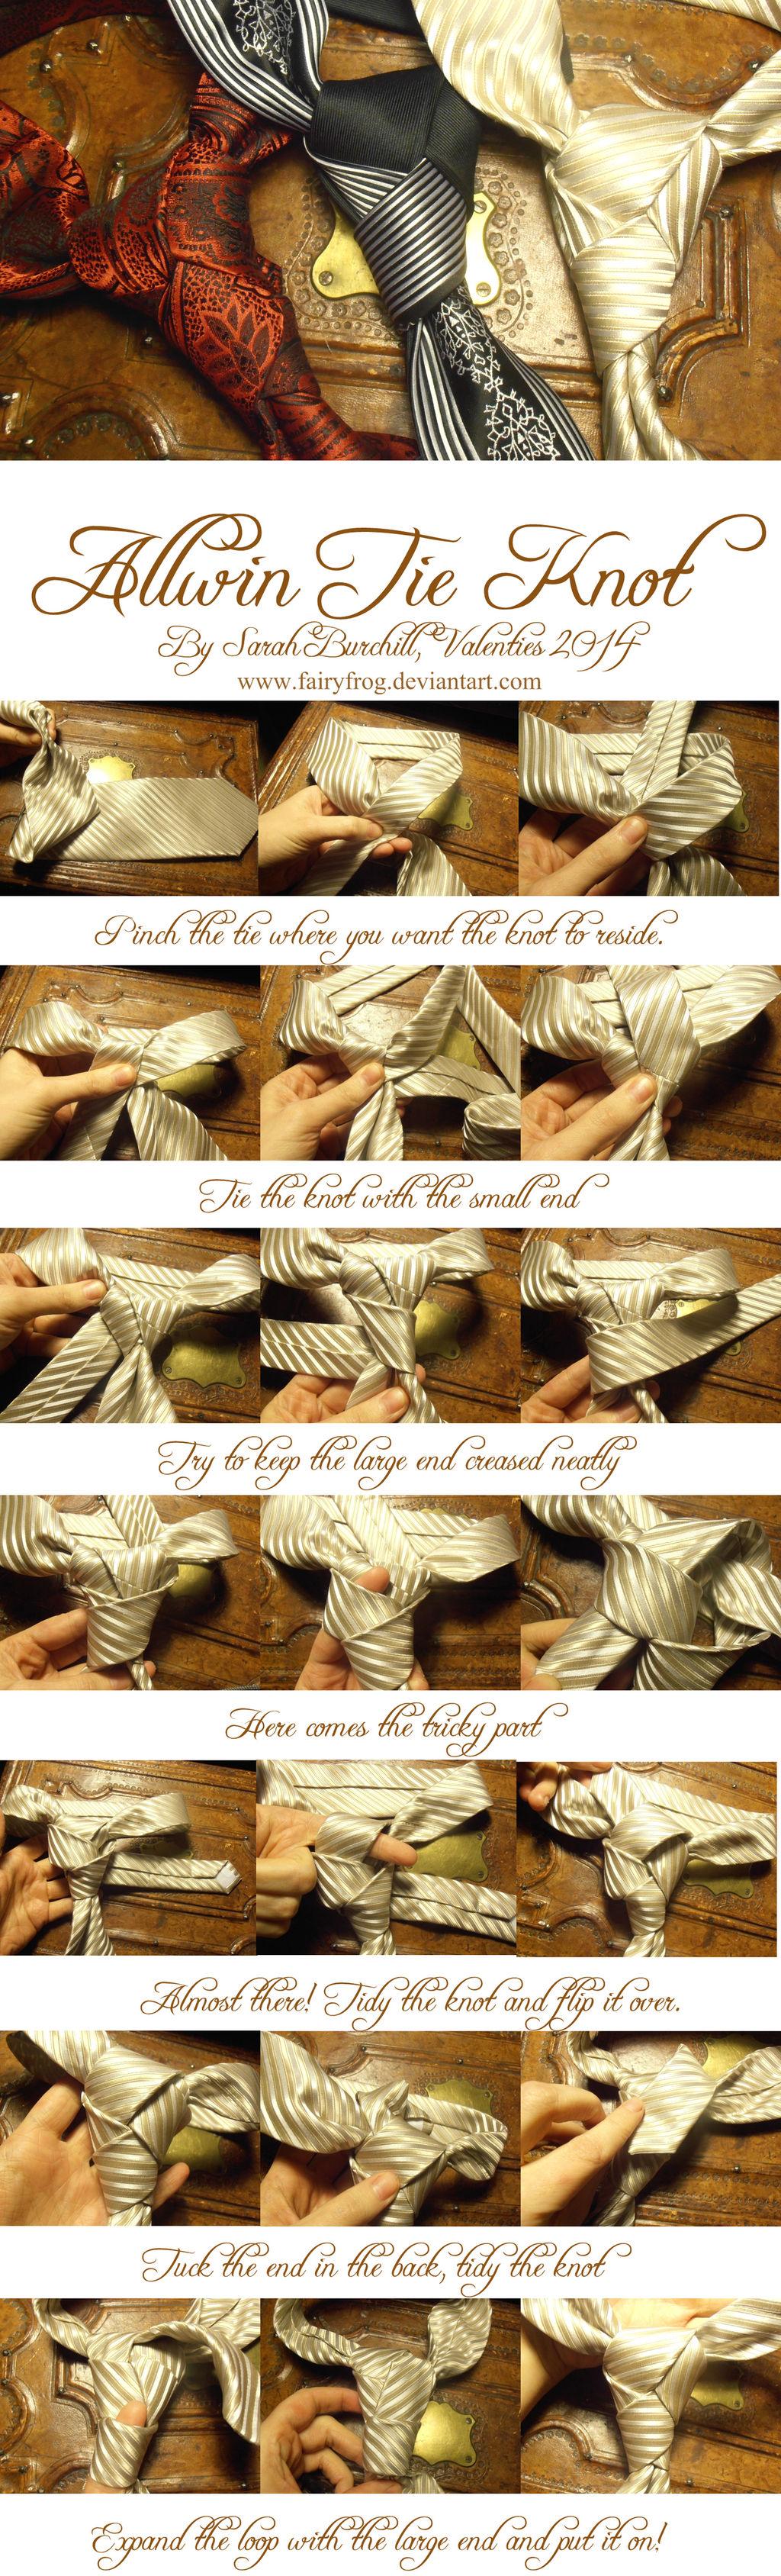 The Allwin tie knot Tutorial by fairyfrog